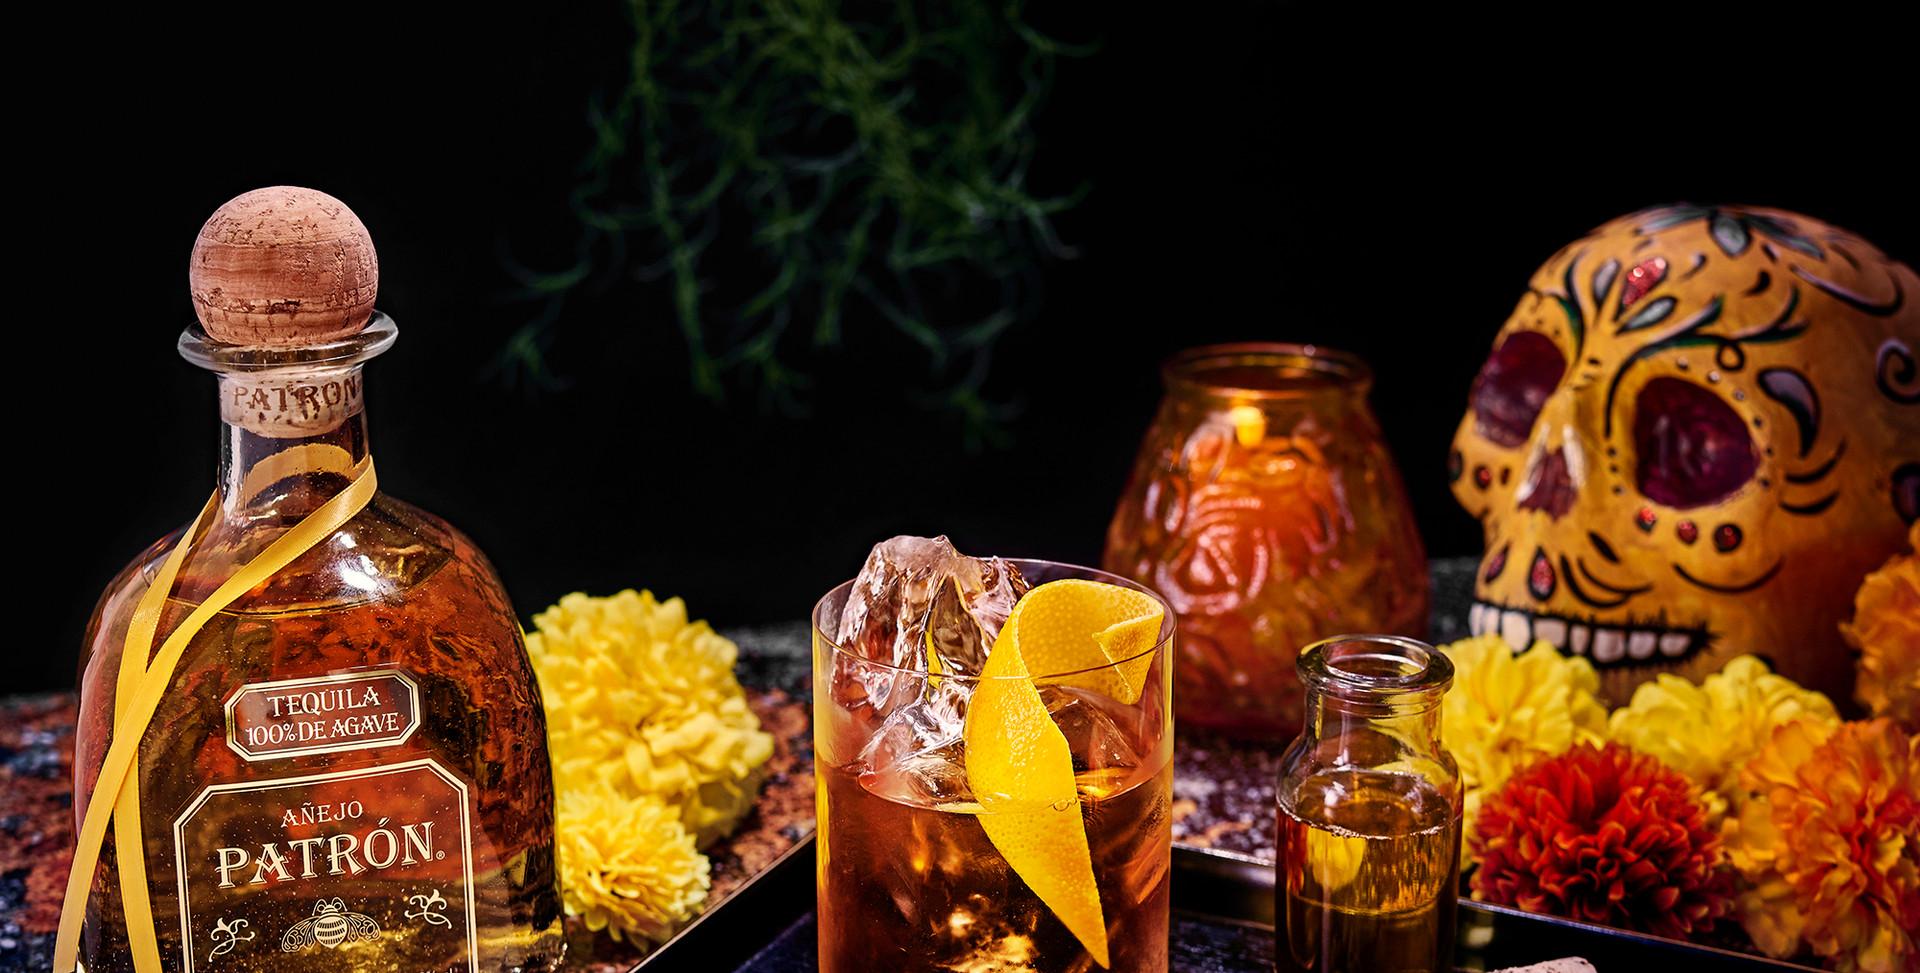 Sweetcorn Old Fashioned